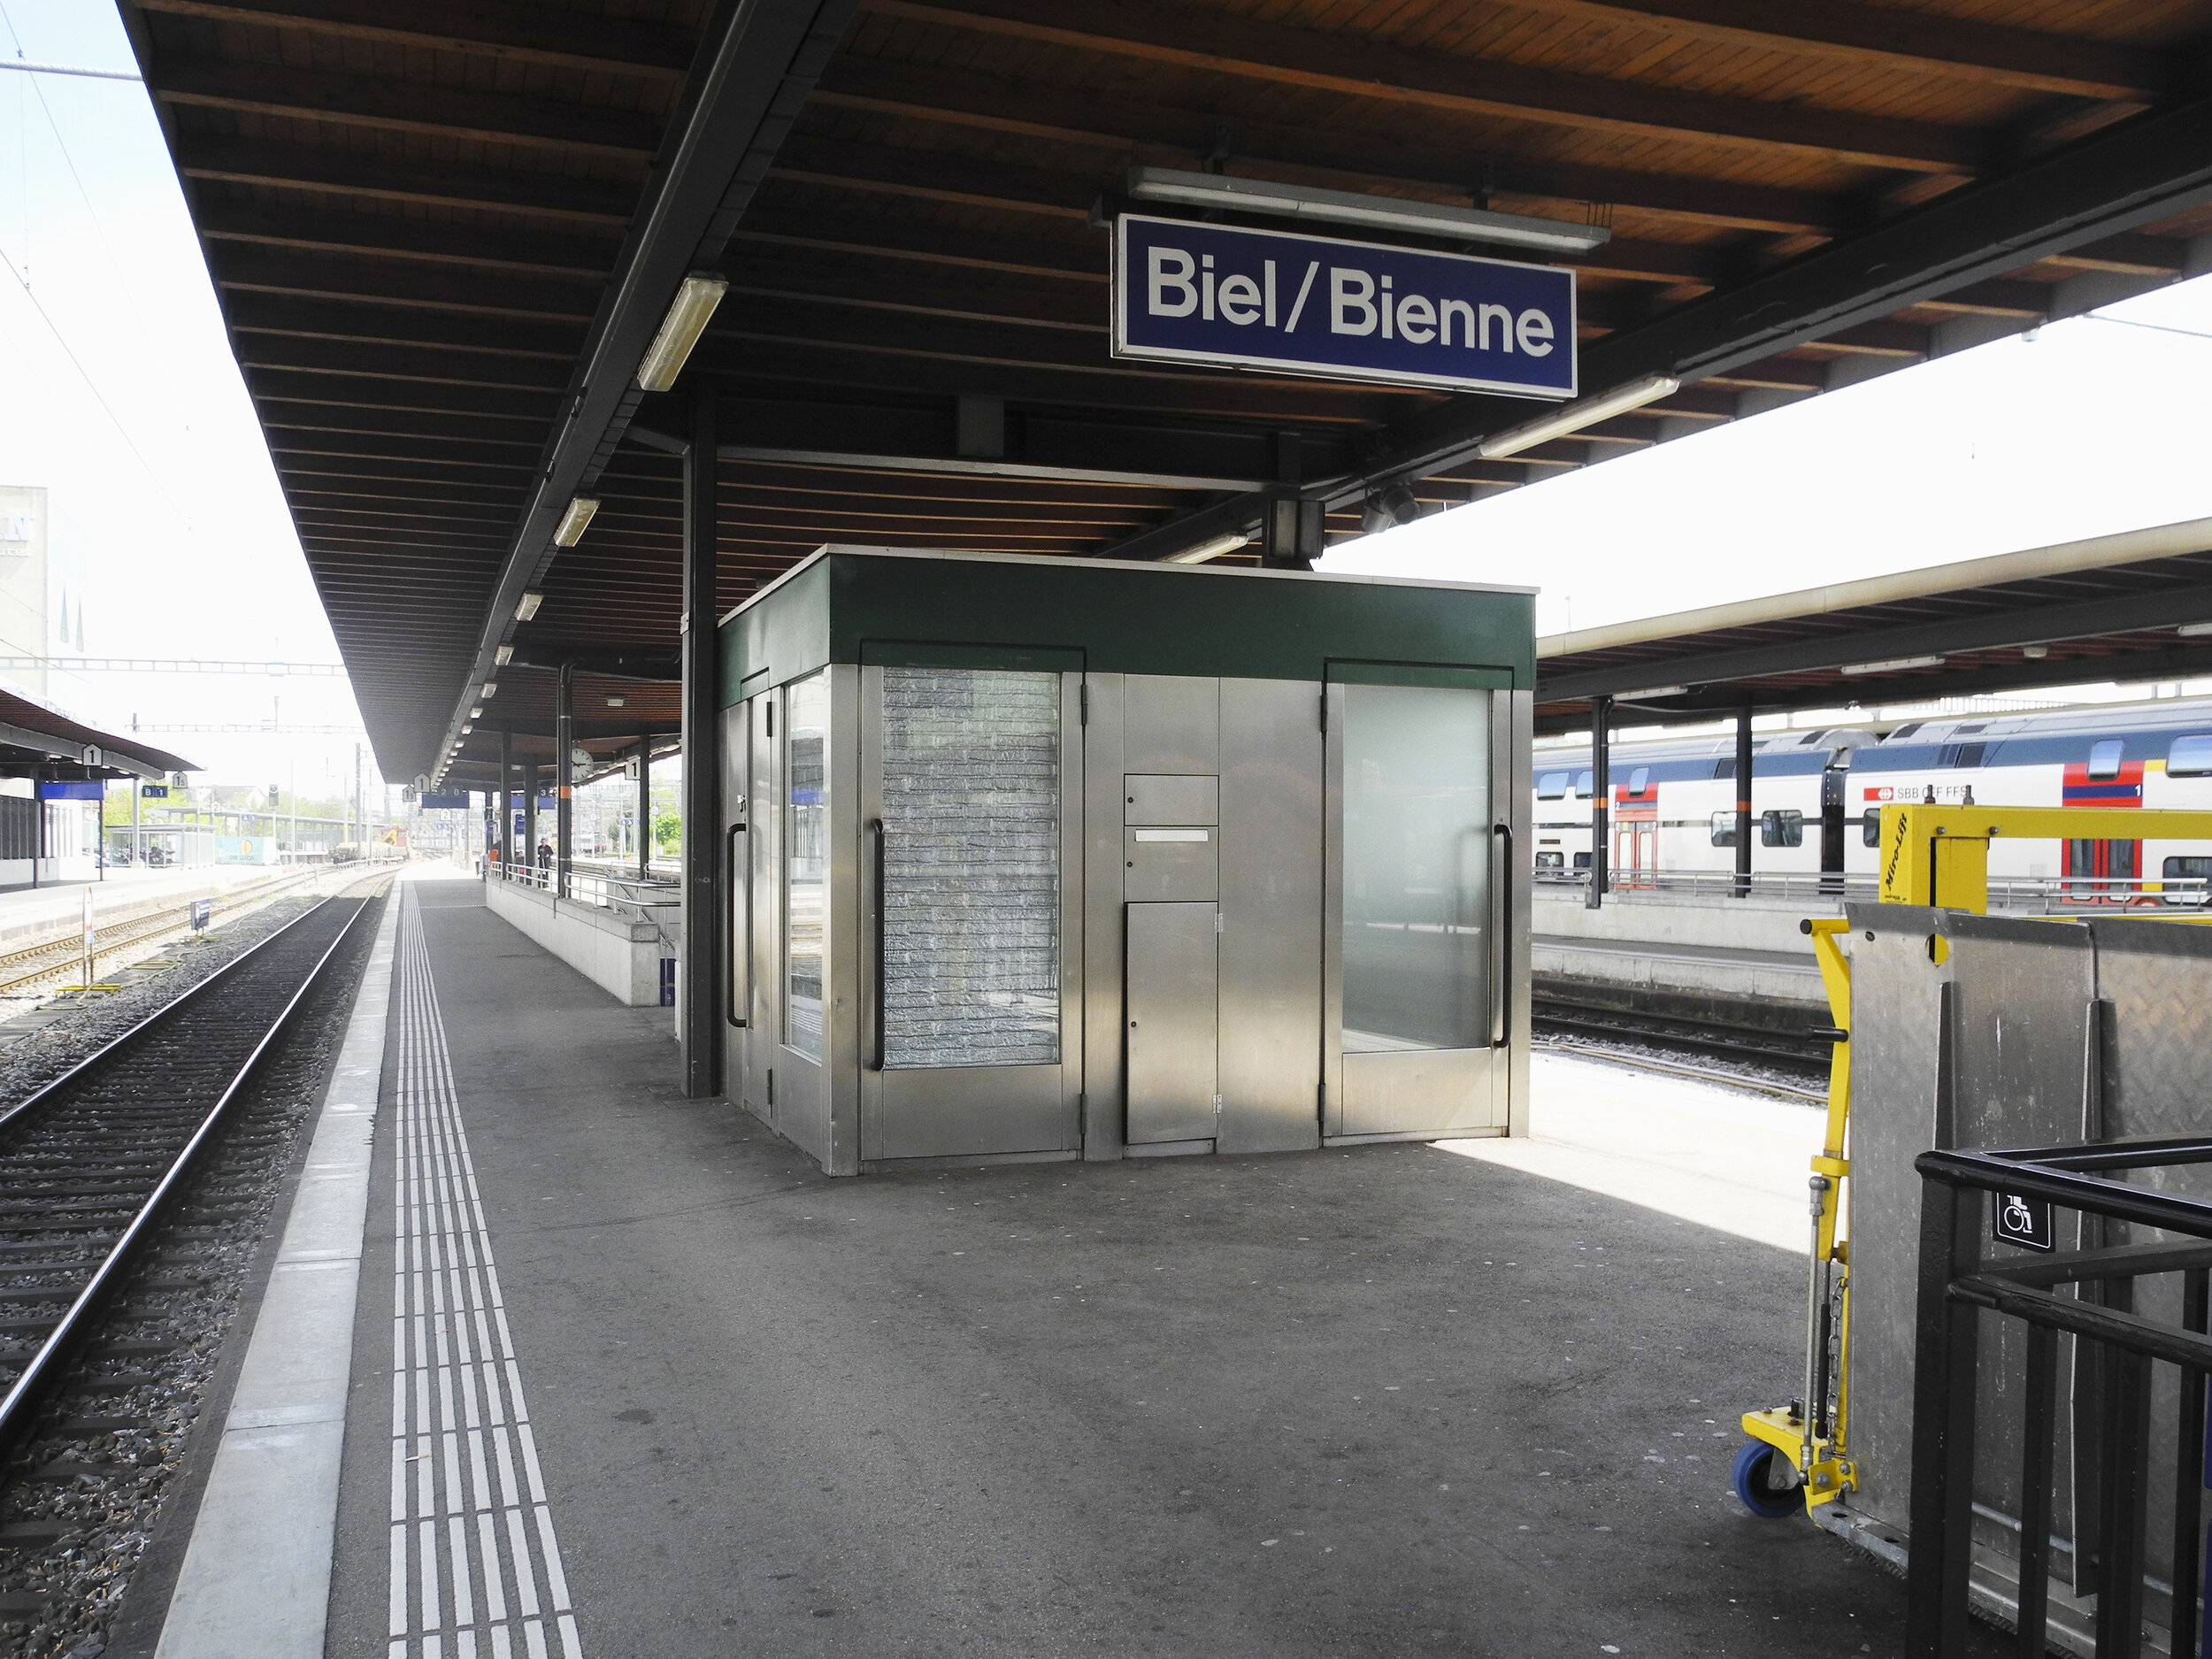 Halley Biel Train Station 1.jpg